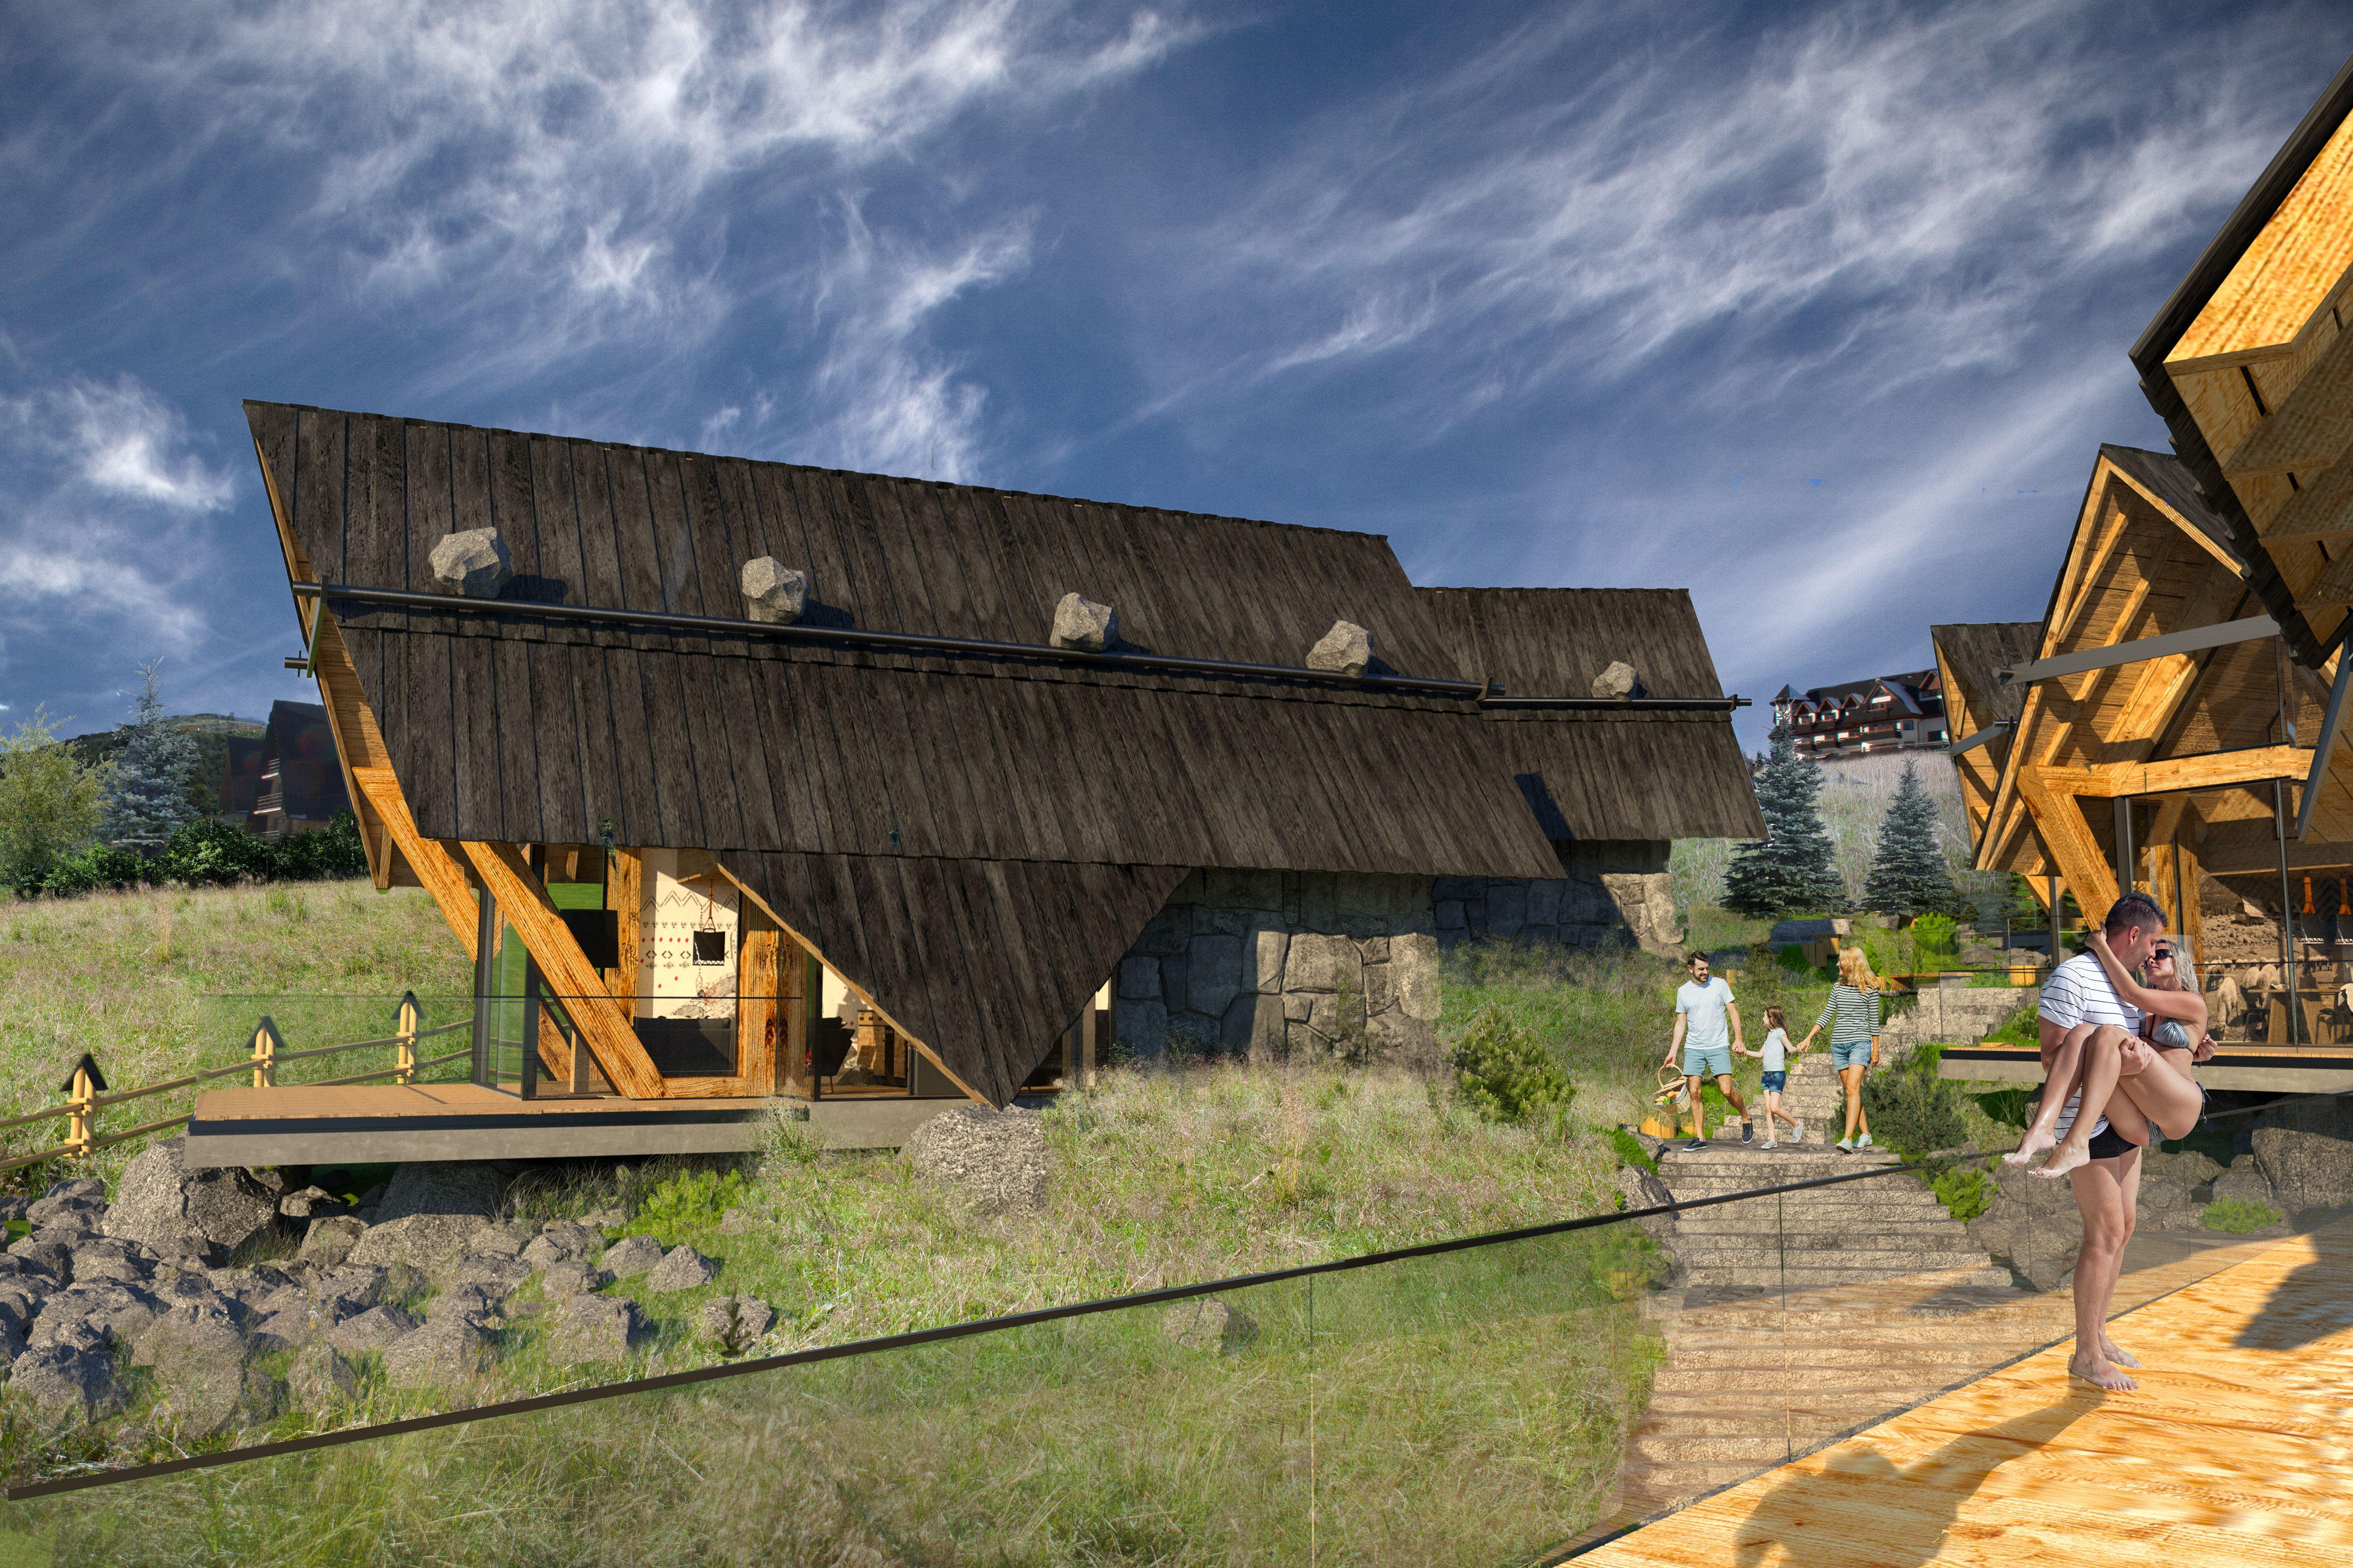 Osada Zakopane Biuro Architektoniczne Karpiel I Steindel Architektura House Styles Zakopane Cabin